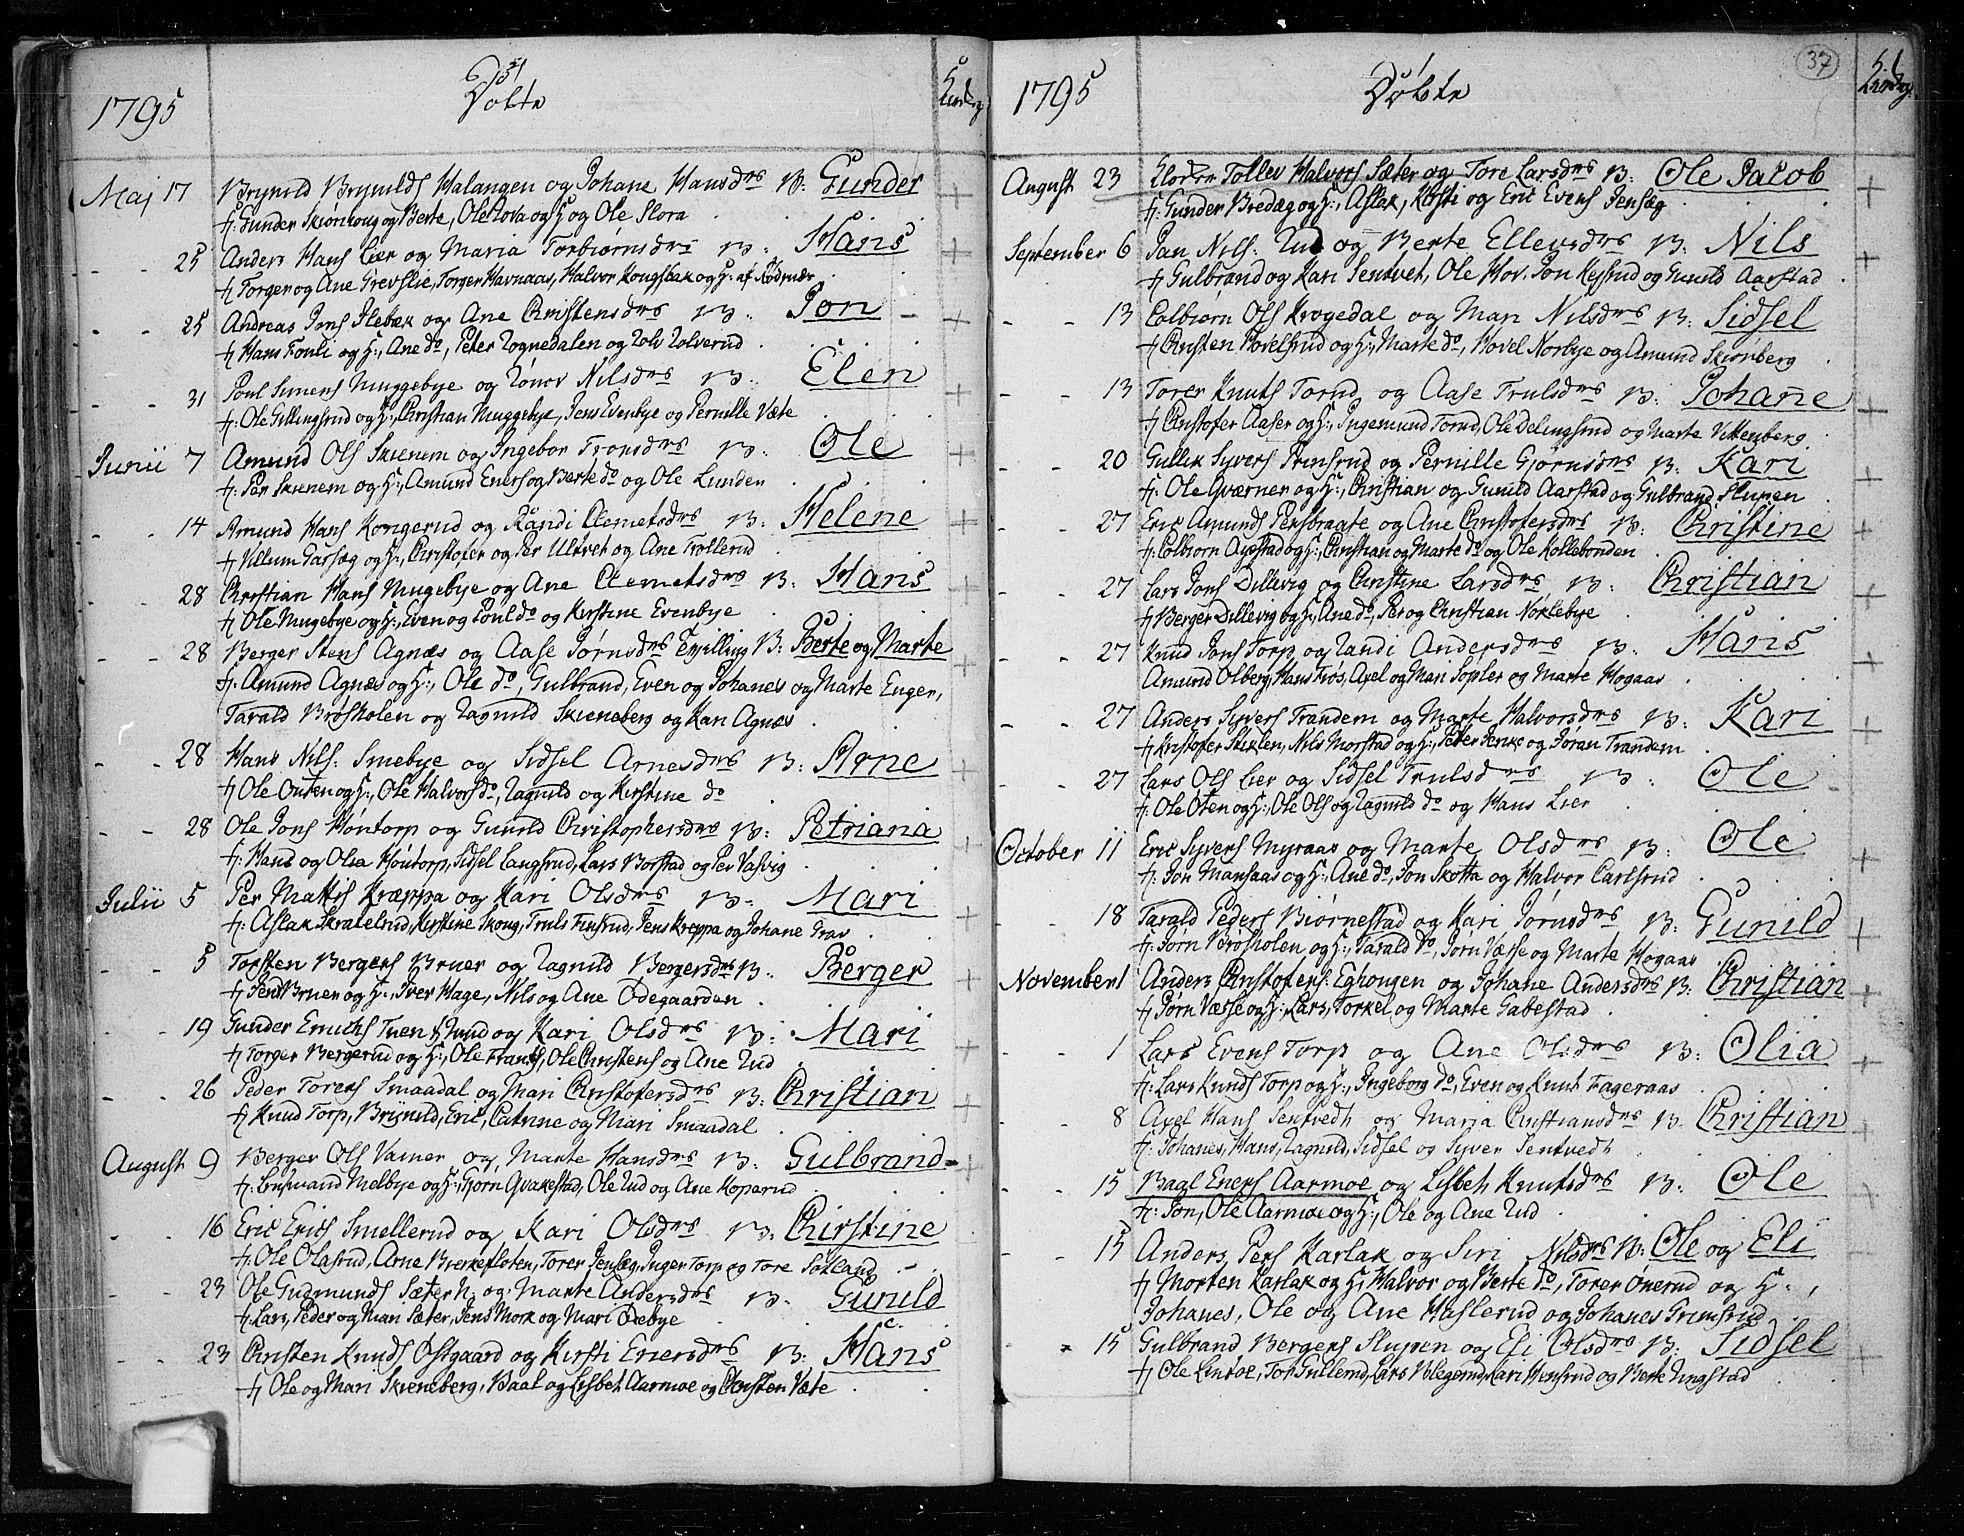 SAO, Trøgstad prestekontor Kirkebøker, F/Fa/L0005: Ministerialbok nr. I 5, 1784-1814, s. 37